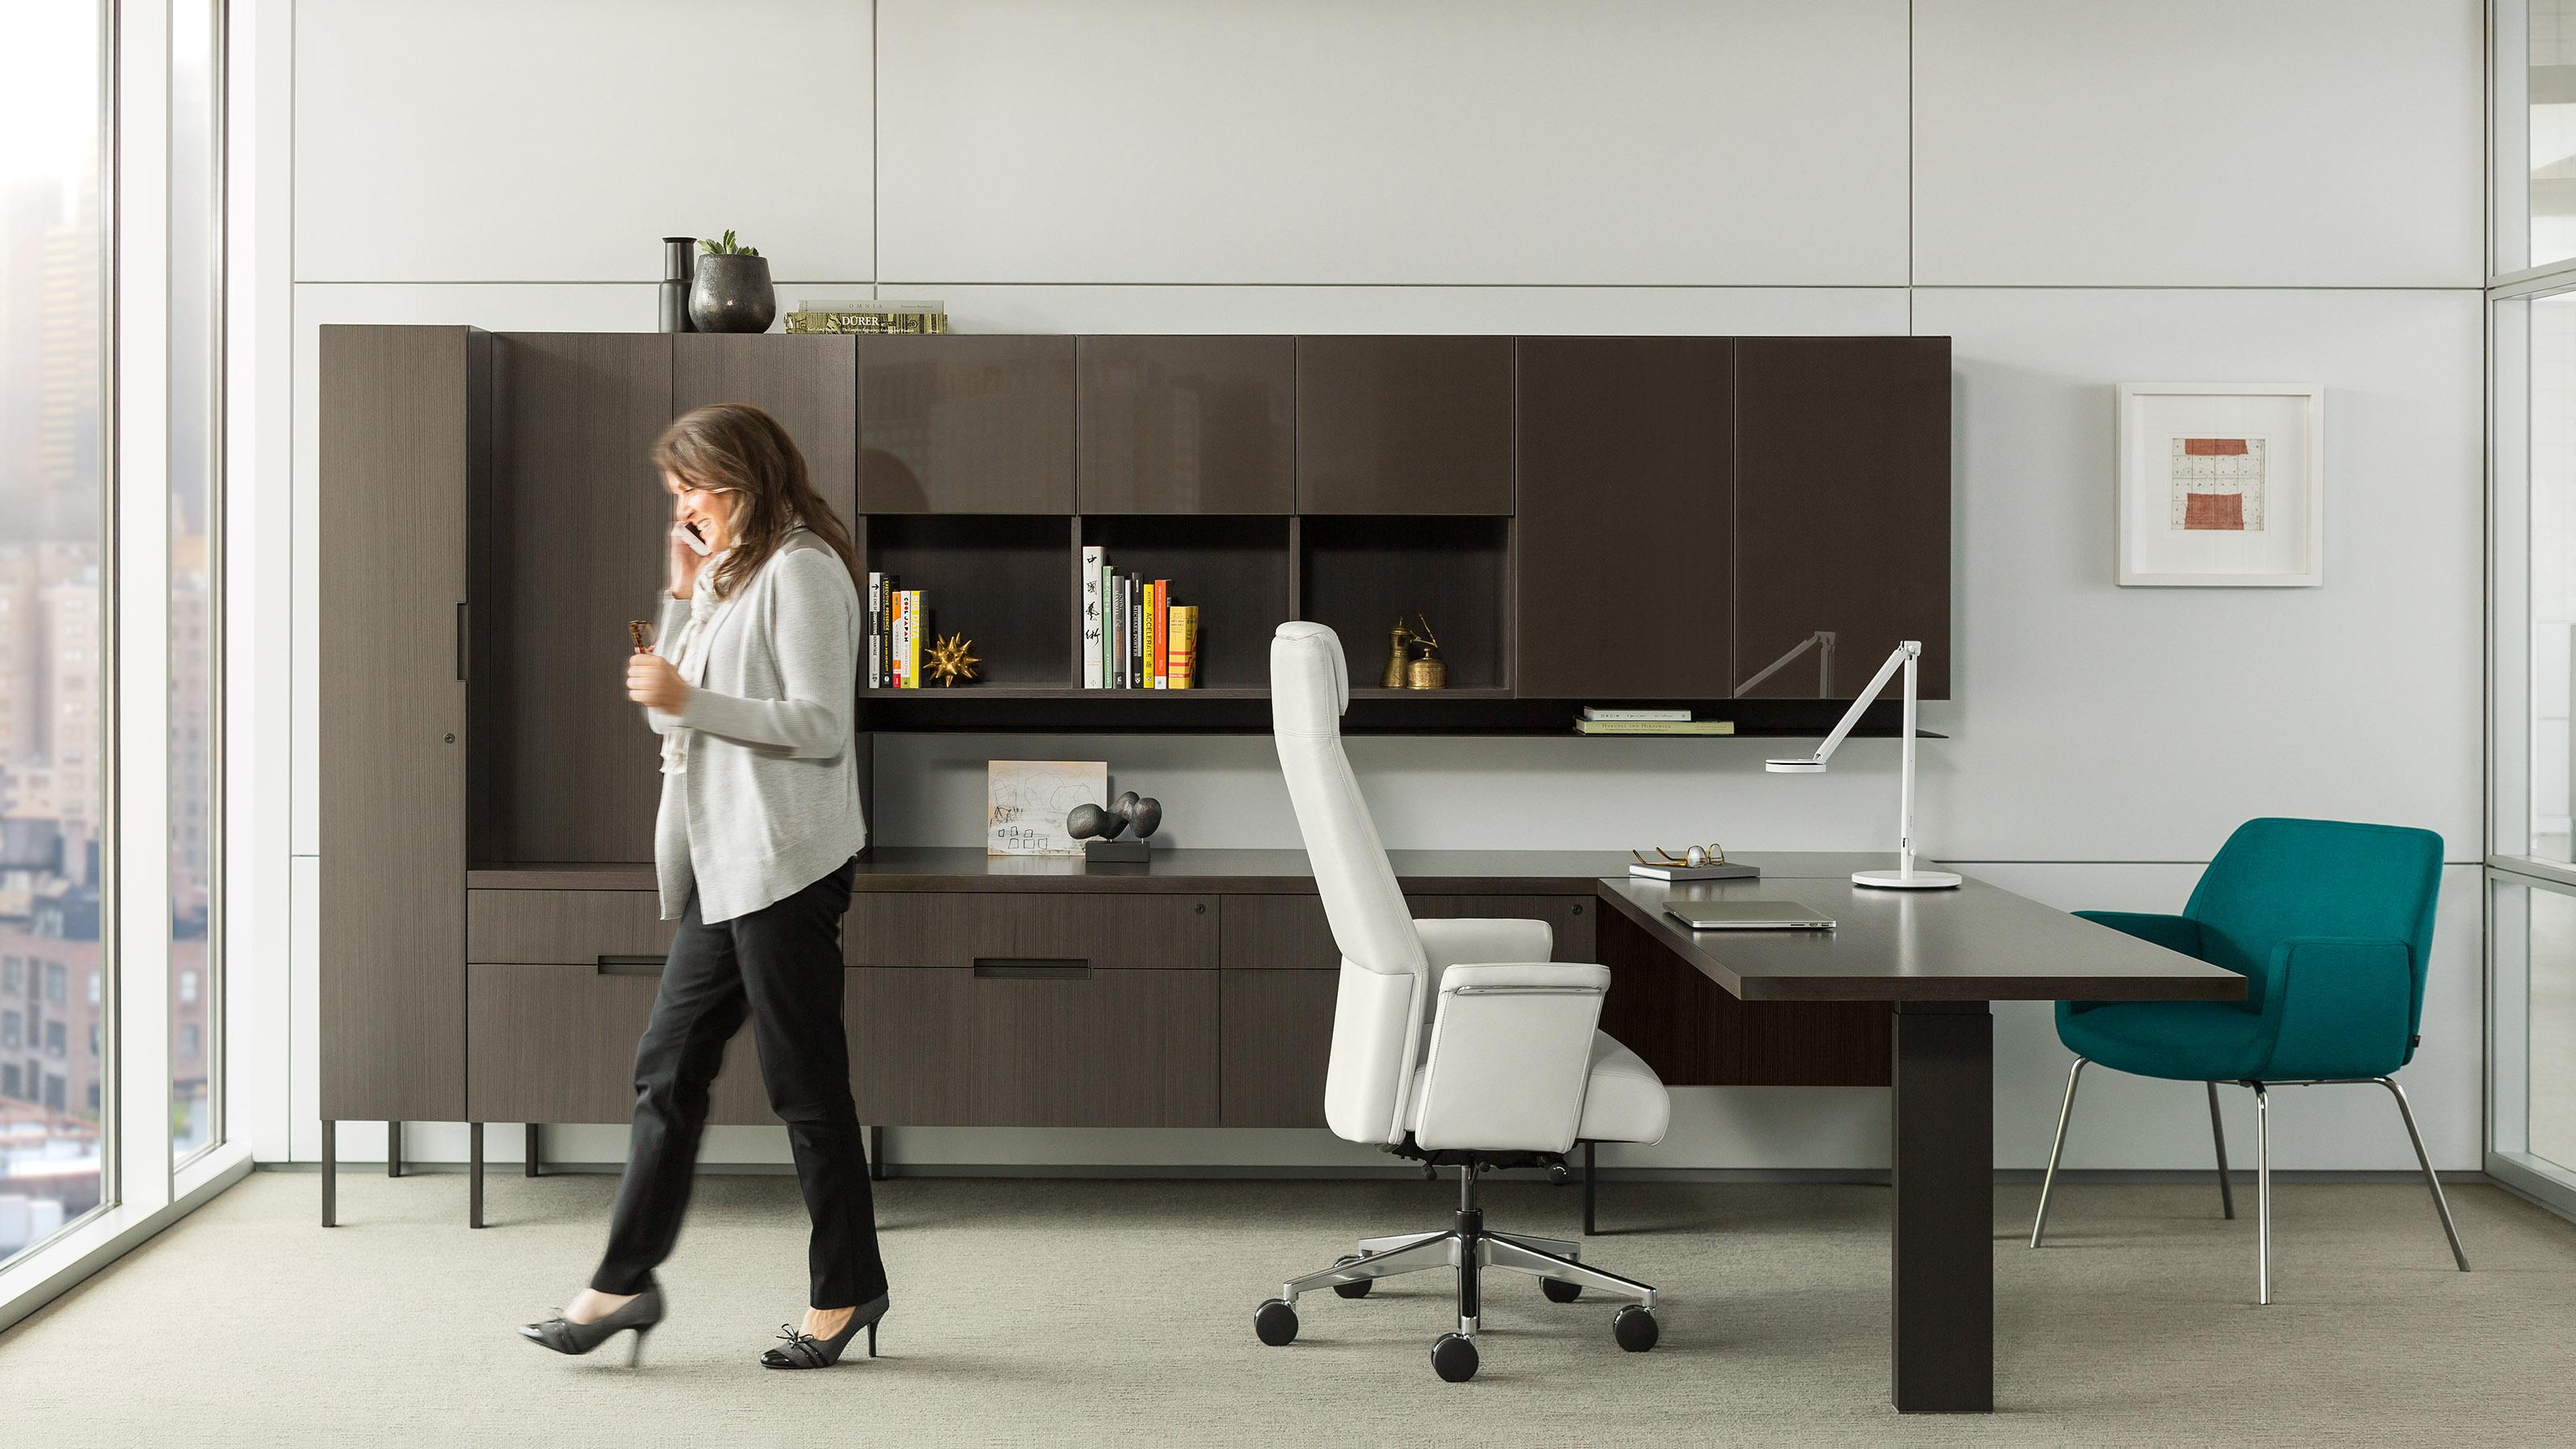 Definition Executive Suites Versus Coworking Es Greetly